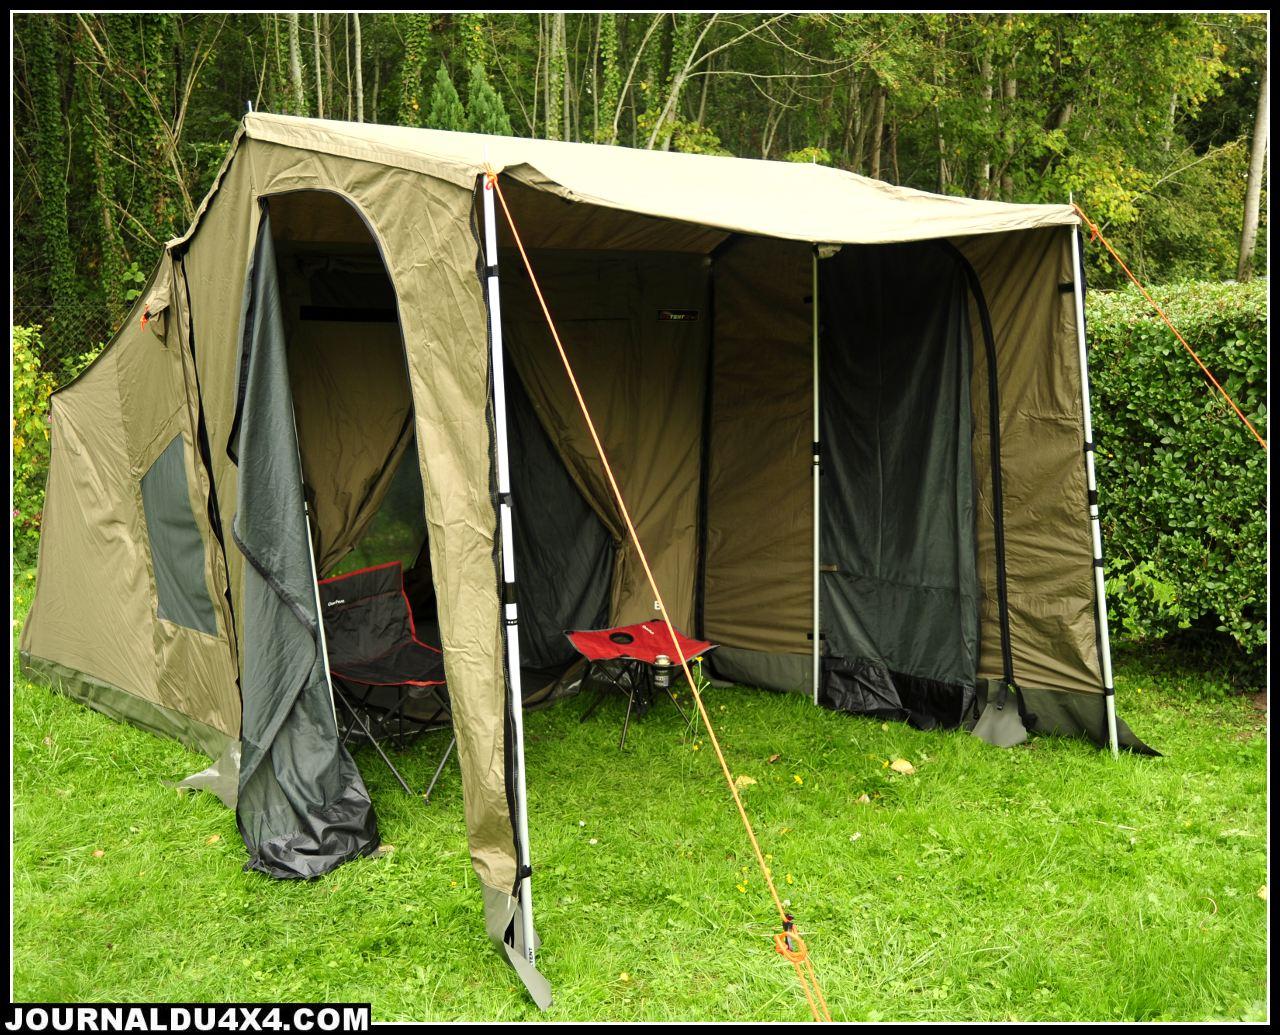 oztent tente camping oz tent. Black Bedroom Furniture Sets. Home Design Ideas